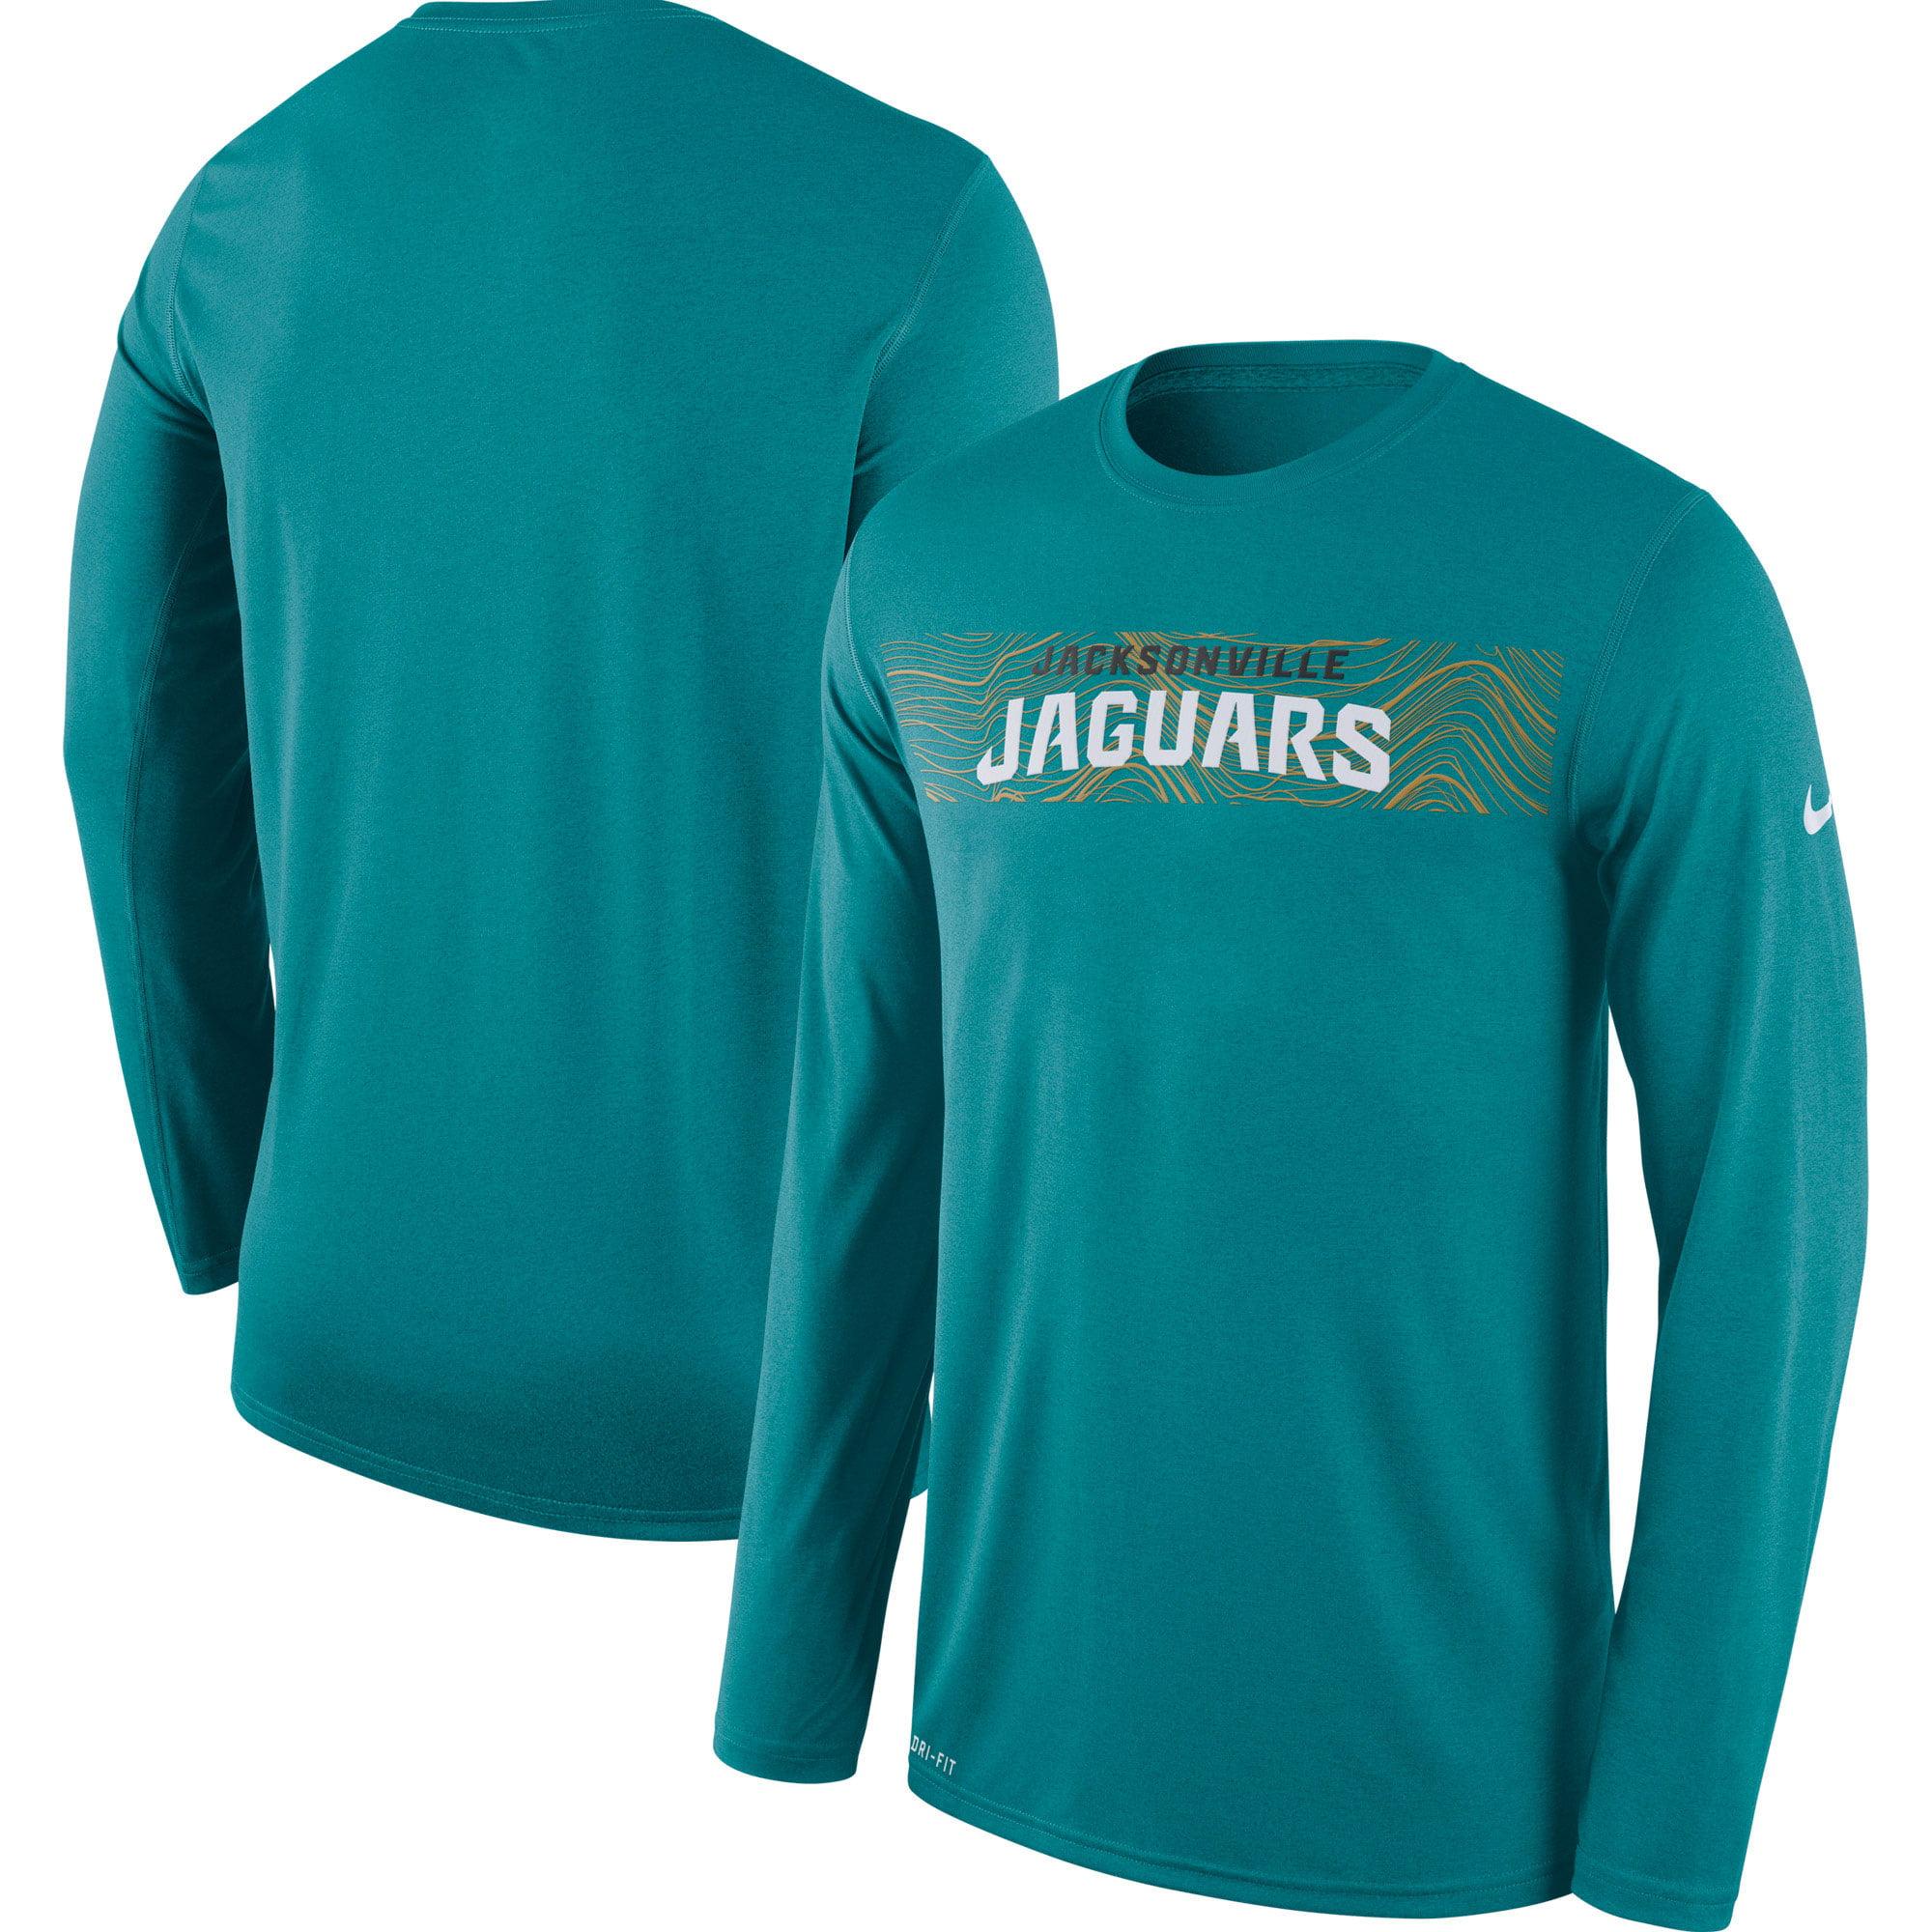 Jacksonville Jaguars Nike Sideline Seismic Legend Long Sleeve T-Shirt - Teal